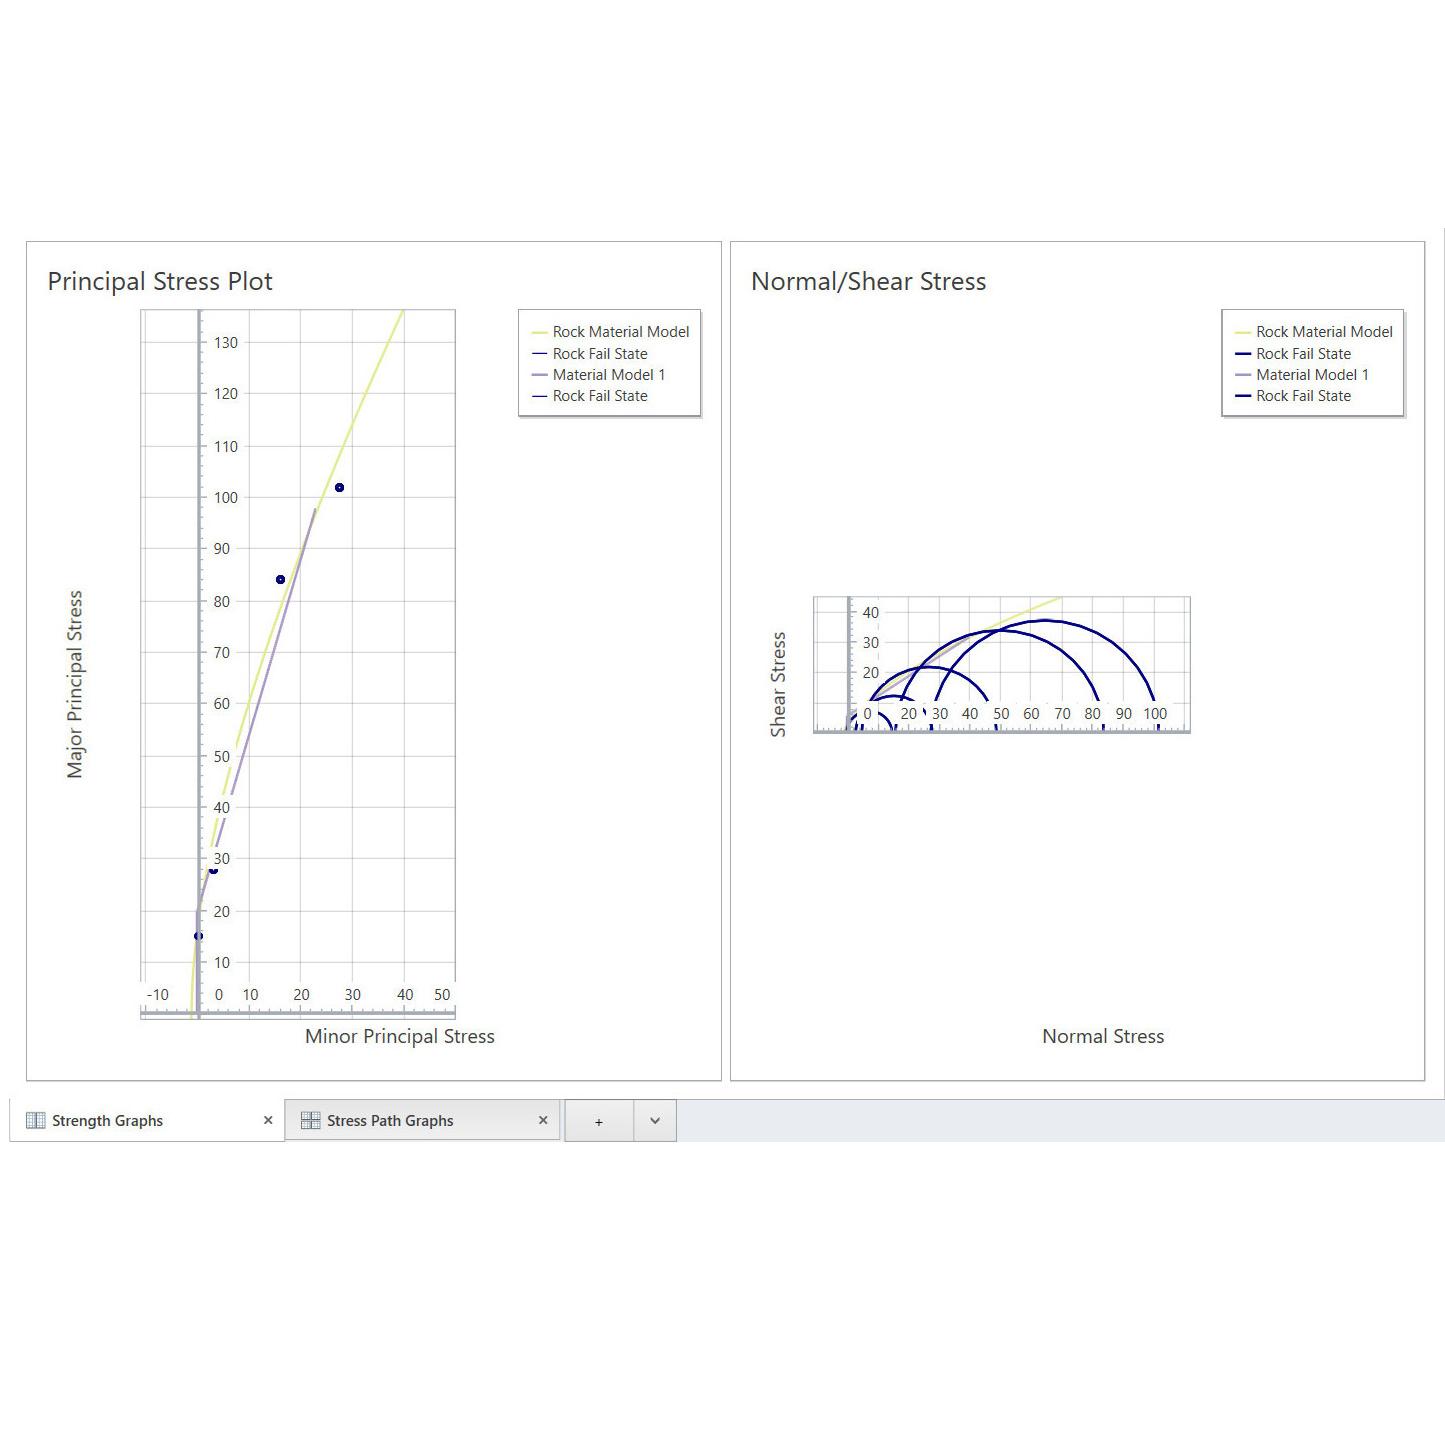 RSData: Strength Graphs Tab